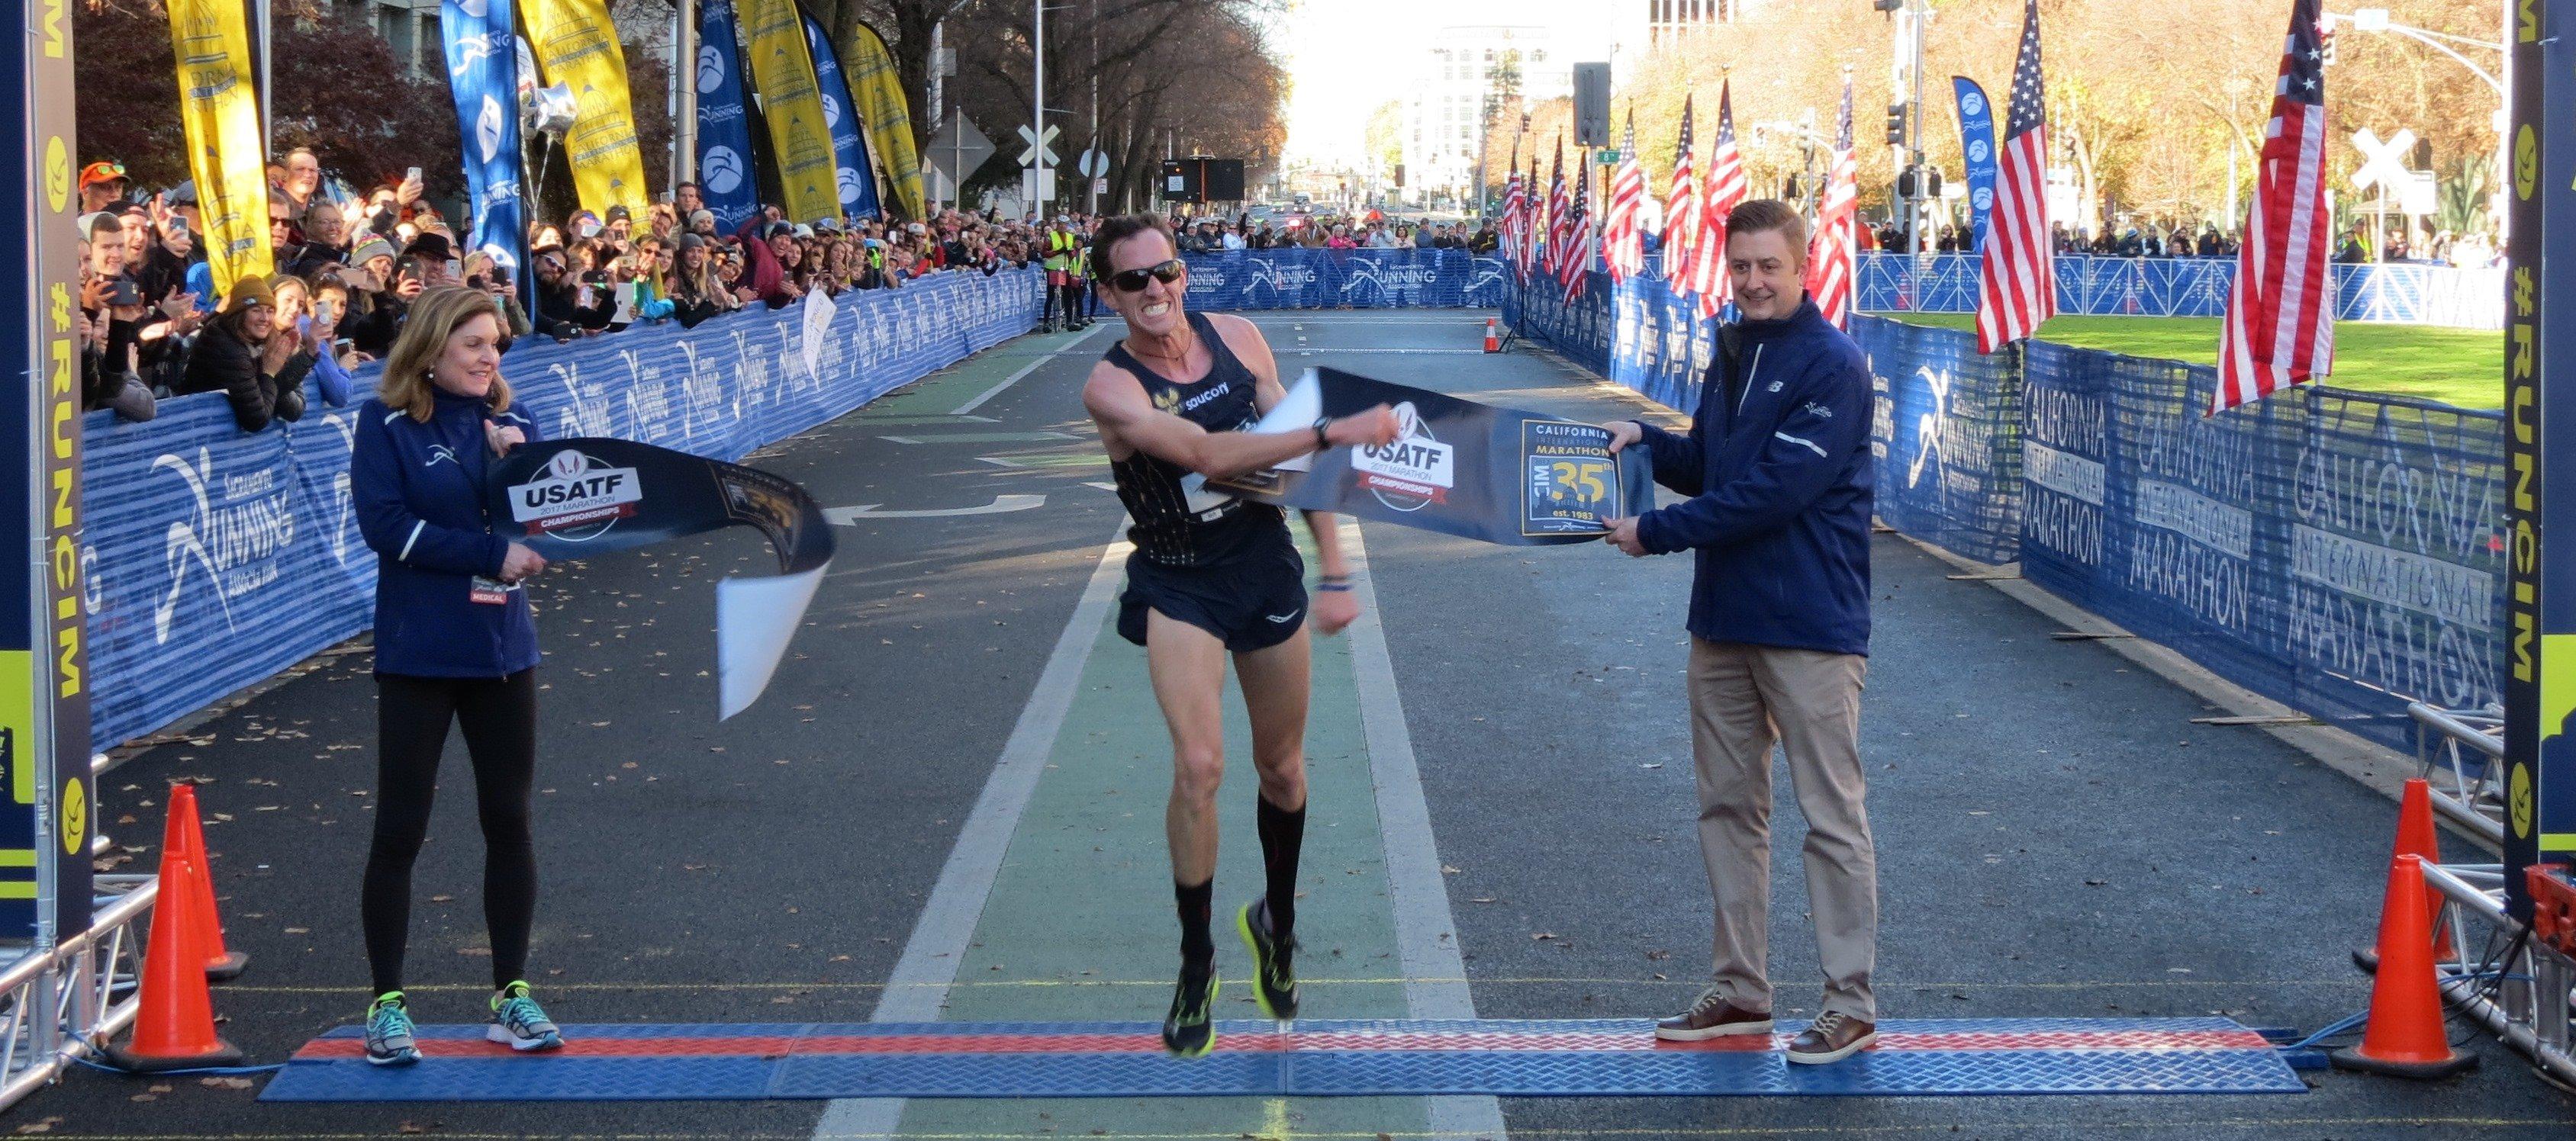 Sara Hall and Tim Ritchie Win 2017 USA Marathon Titles At